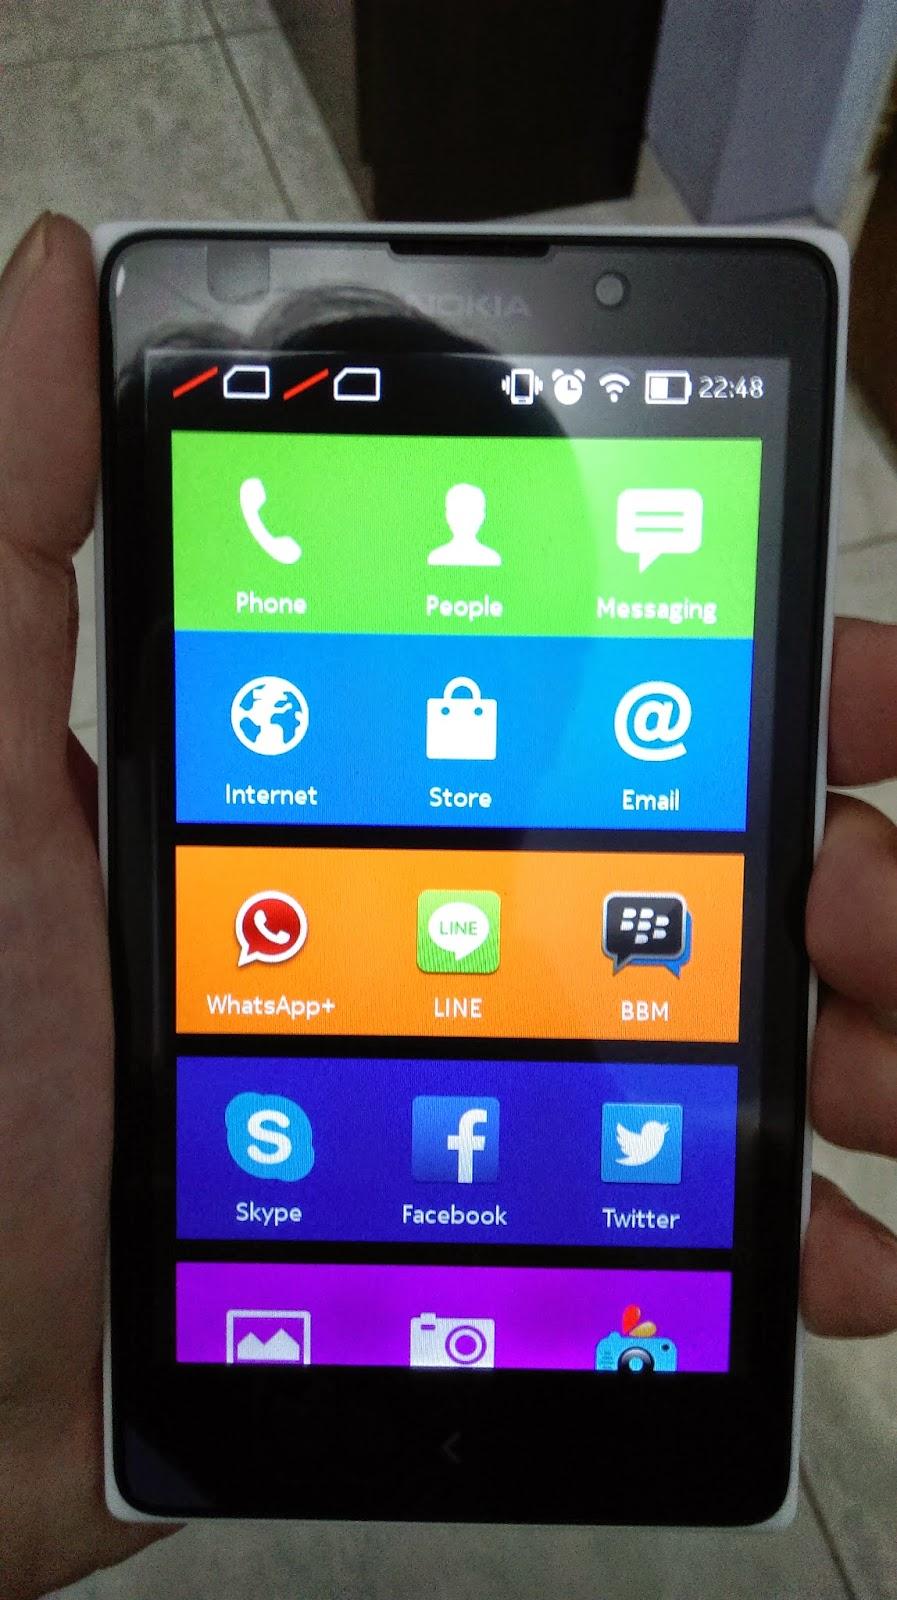 Info Harga Nokia X Dual Sim Update 2018 Backpack Pria Raindoz Bbr611 Review Xl Rm 1030 Gadget Operating System Software Platform 11 Berbasis Android